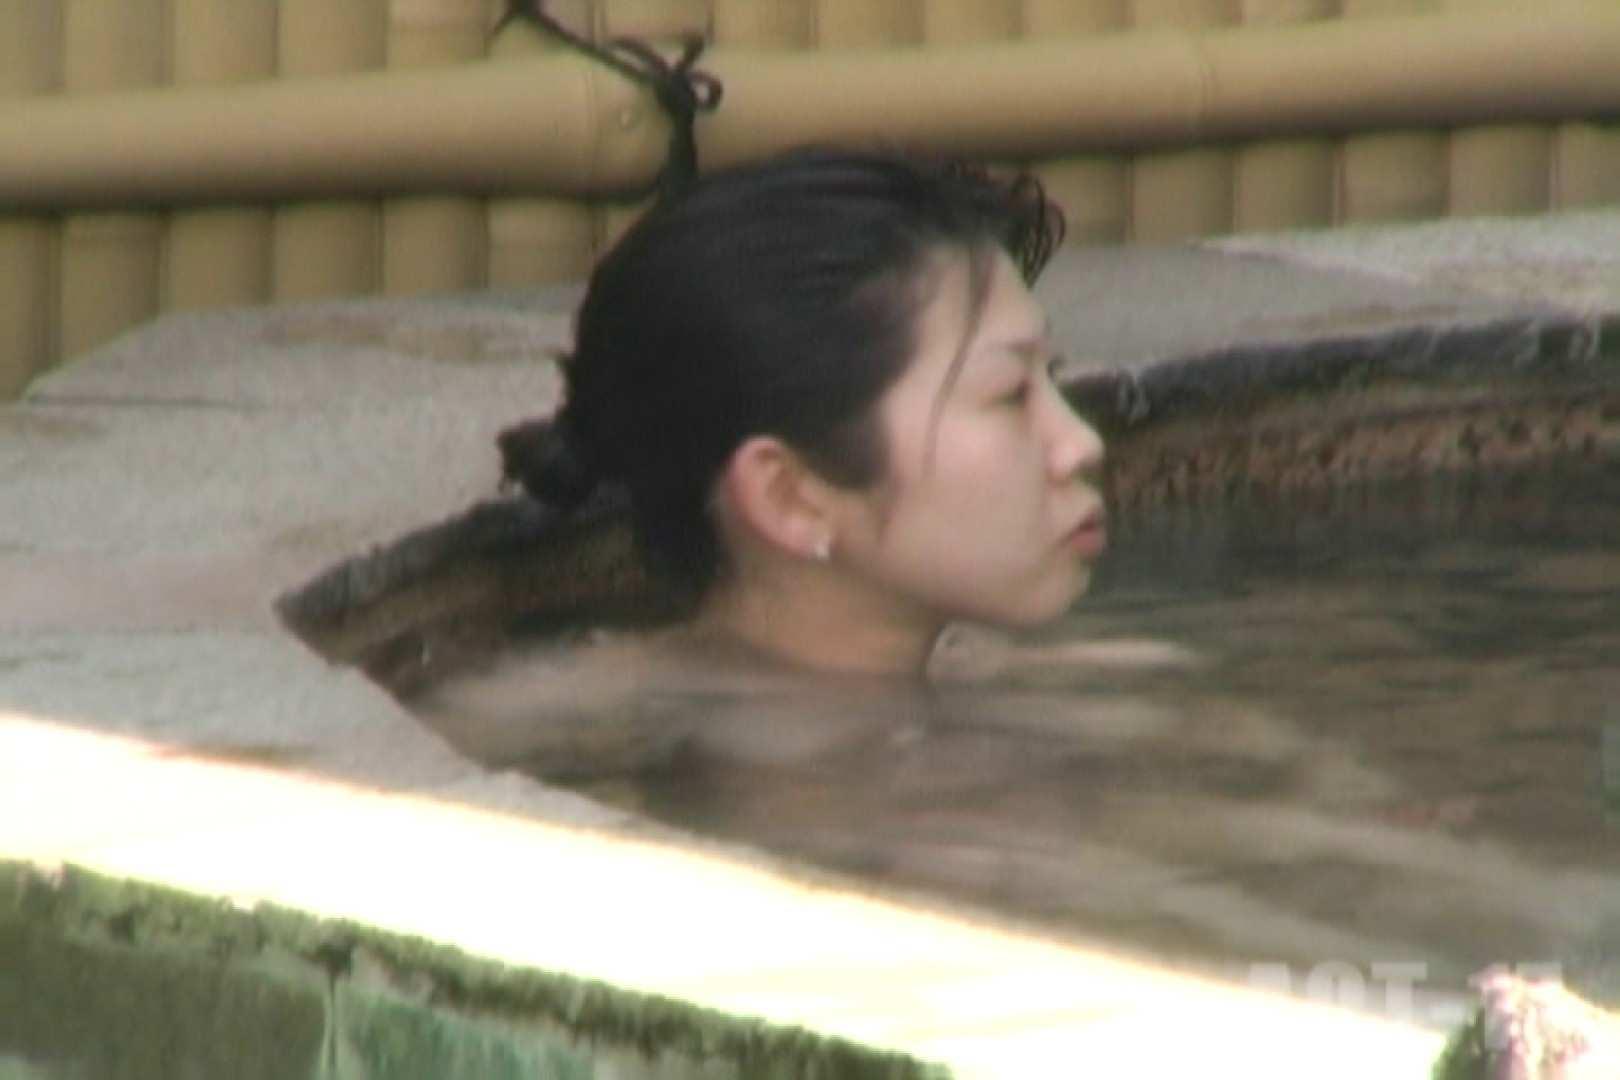 Aquaな露天風呂Vol.850 盗撮 AV無料動画キャプチャ 76連発 65